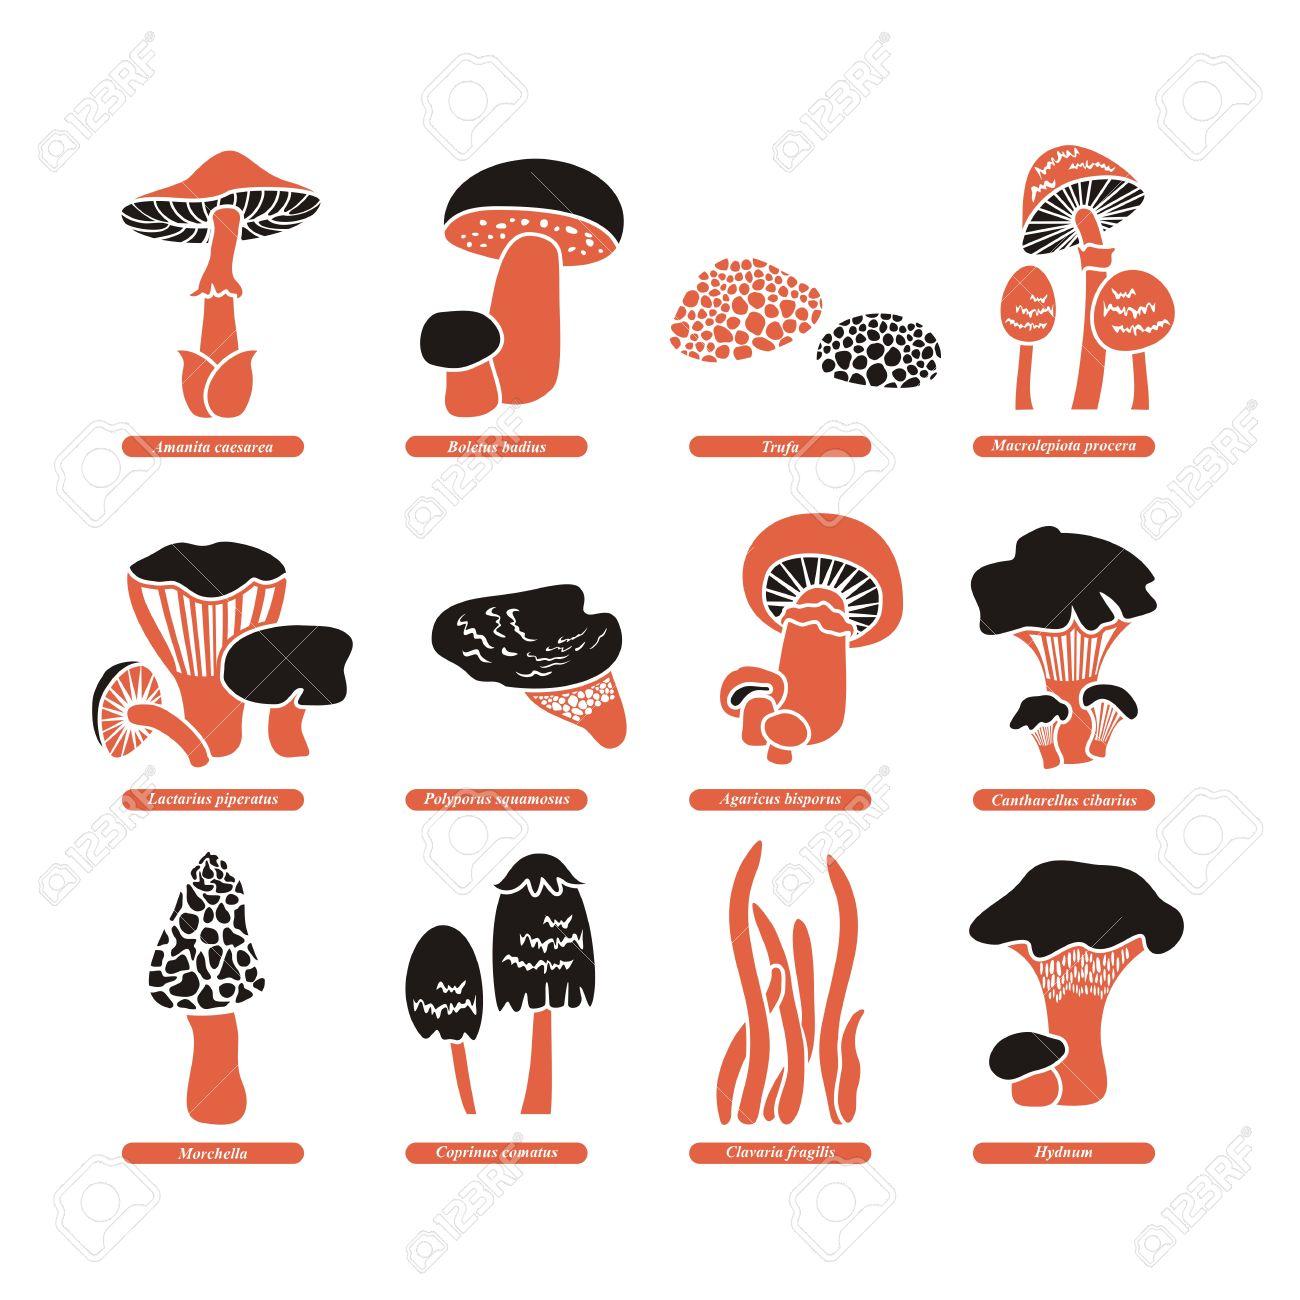 Set With Various Edible Fungi And Their Latin Names Stock Vector